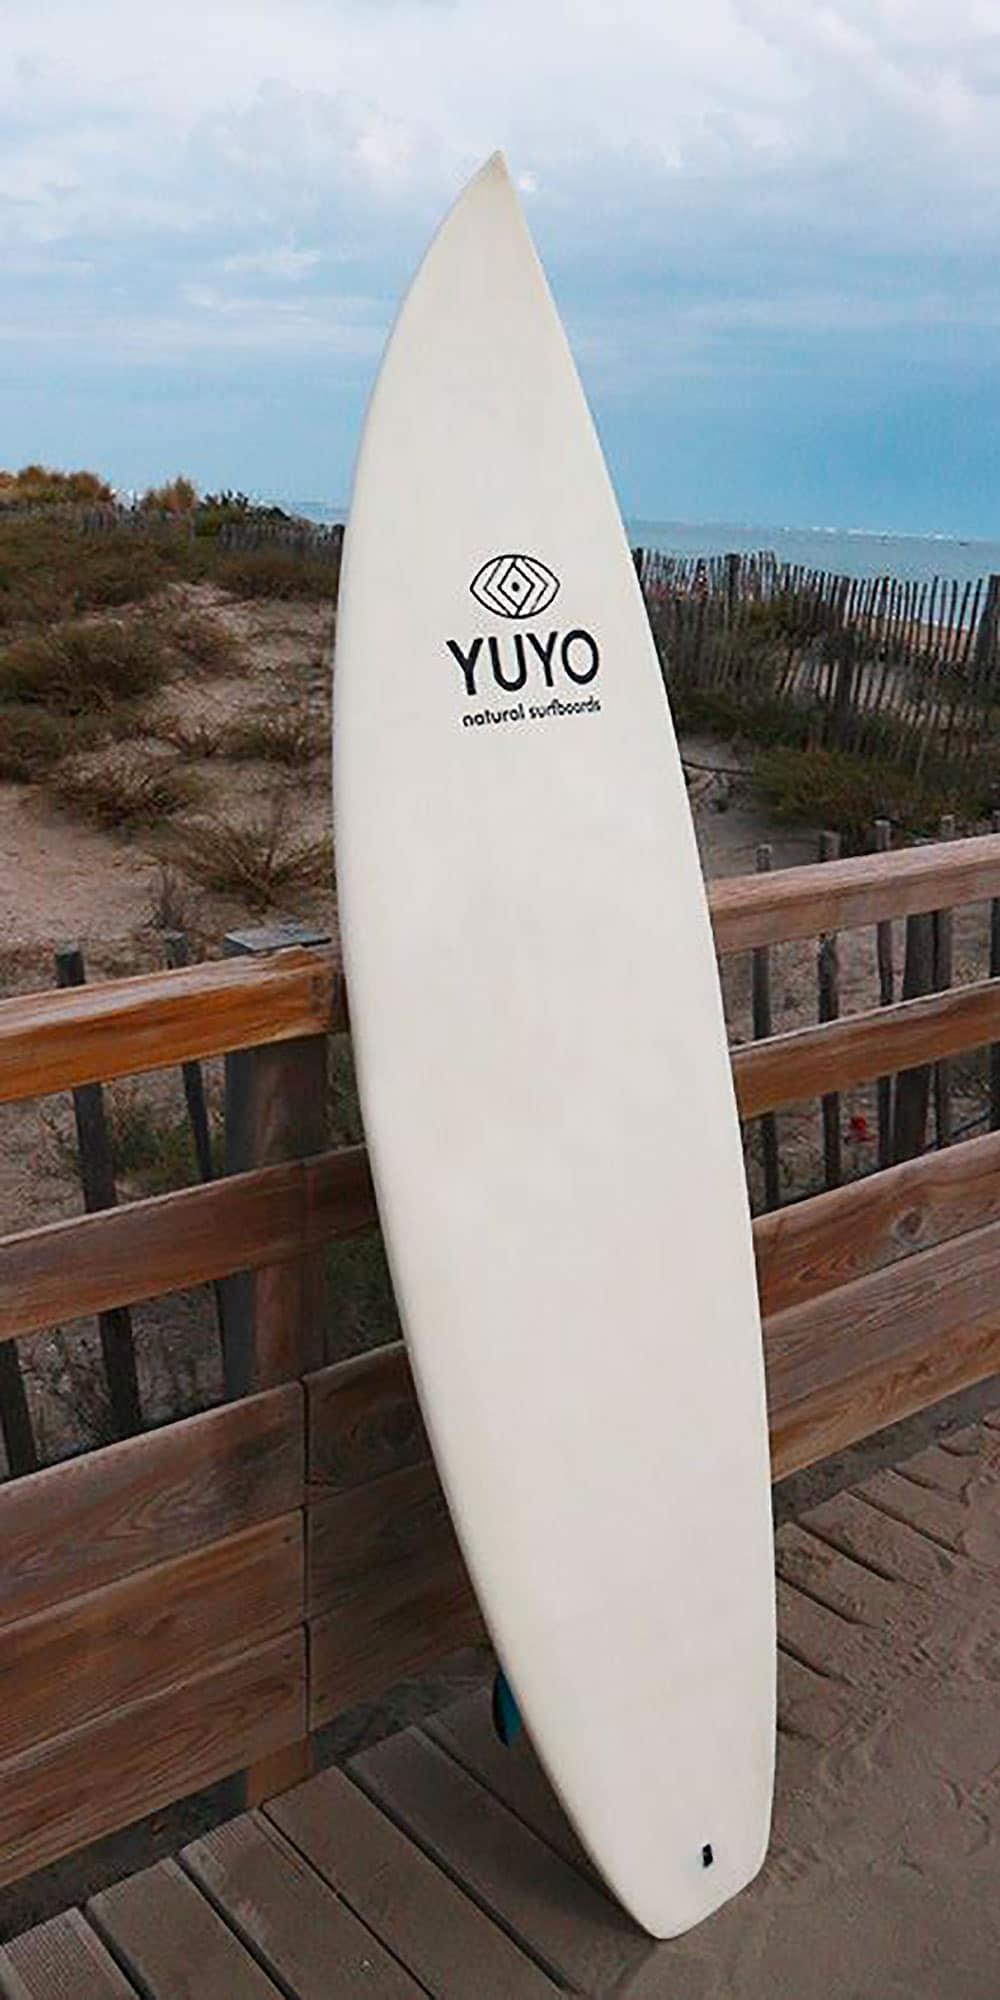 Yuyo planches en matières naturelles ou recyclées